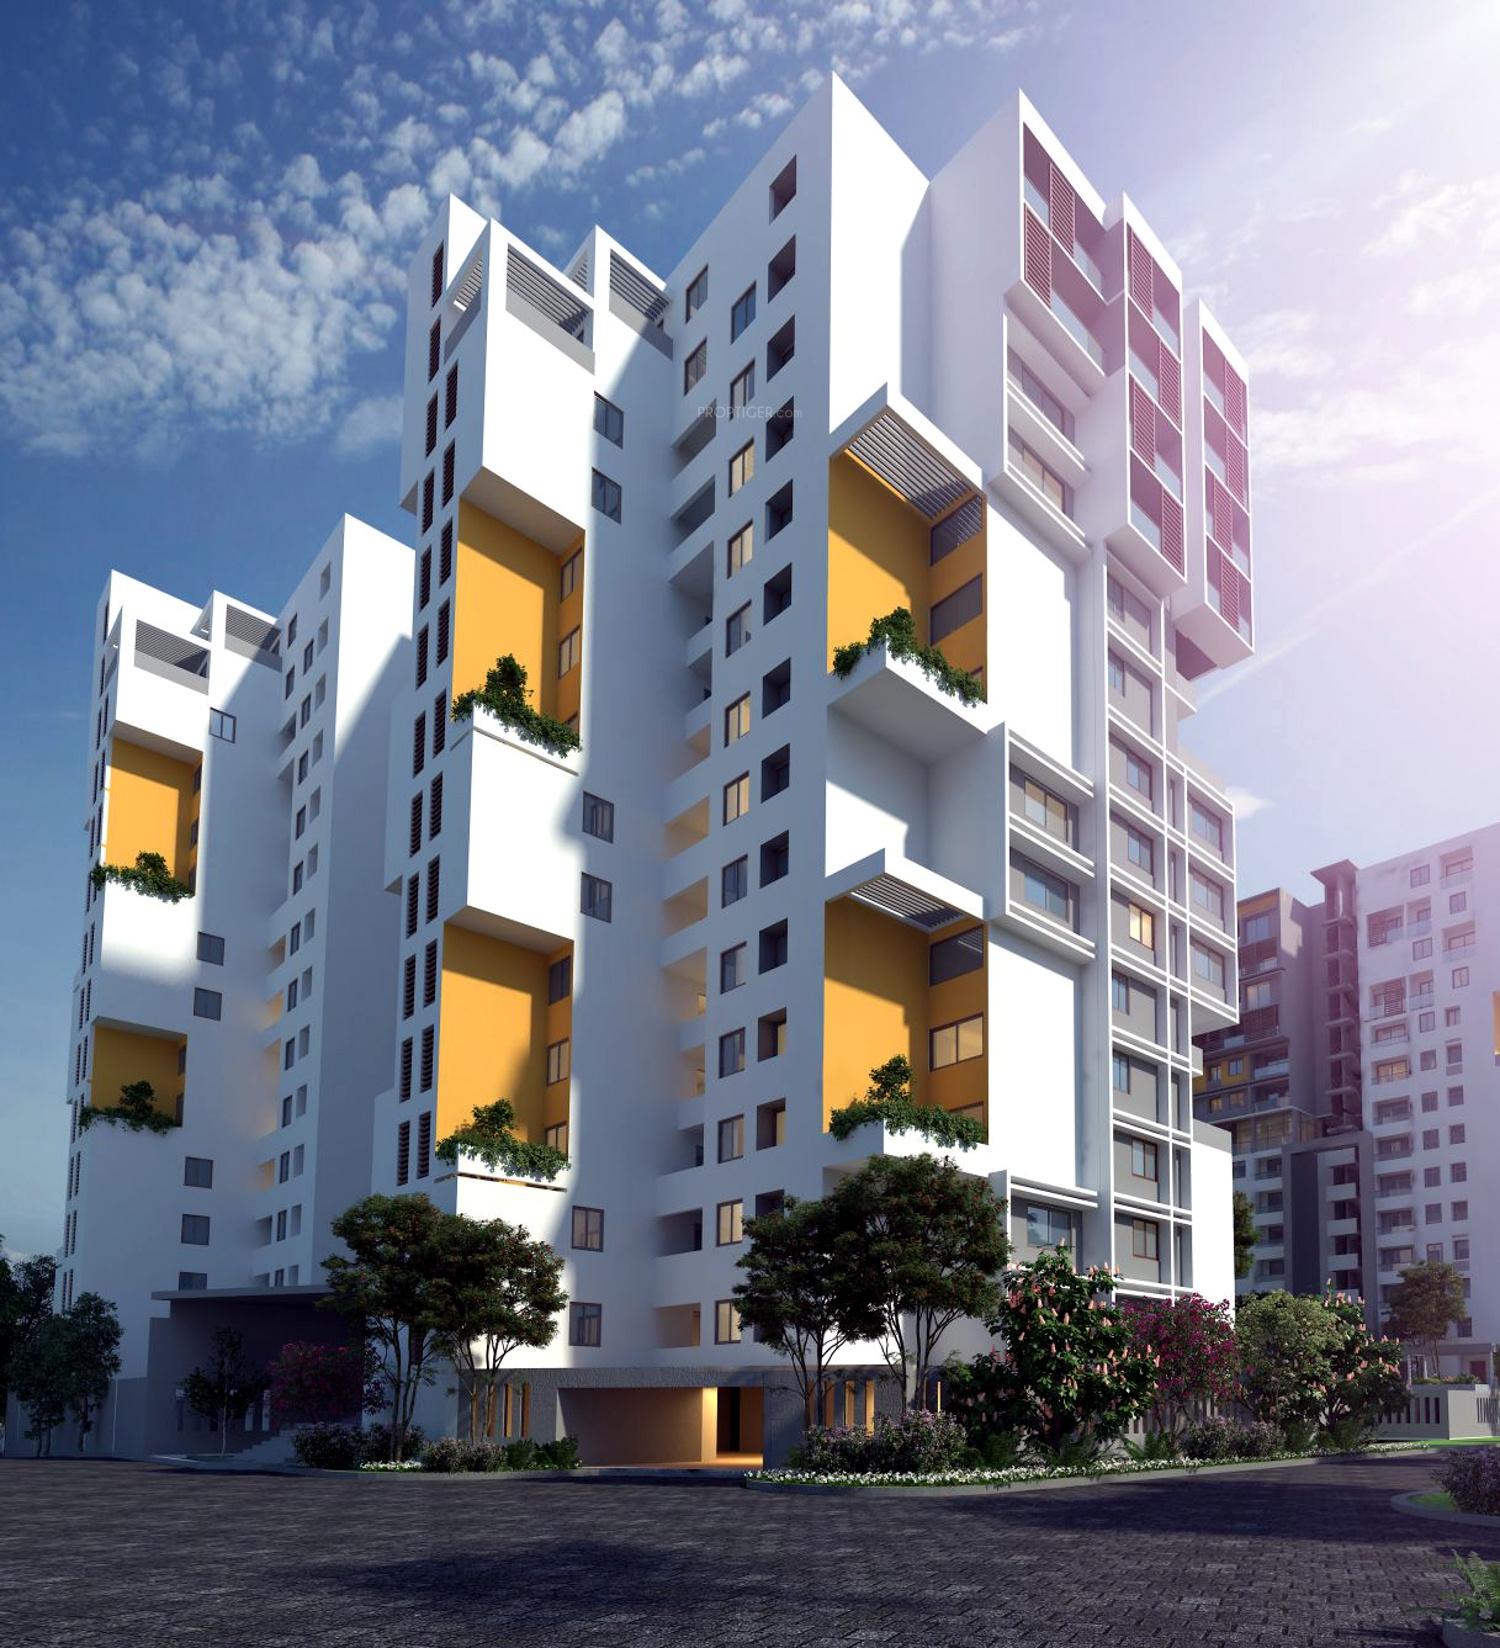 Casagrand ECR 14 In Kanathur Reddikuppam Chennai Price